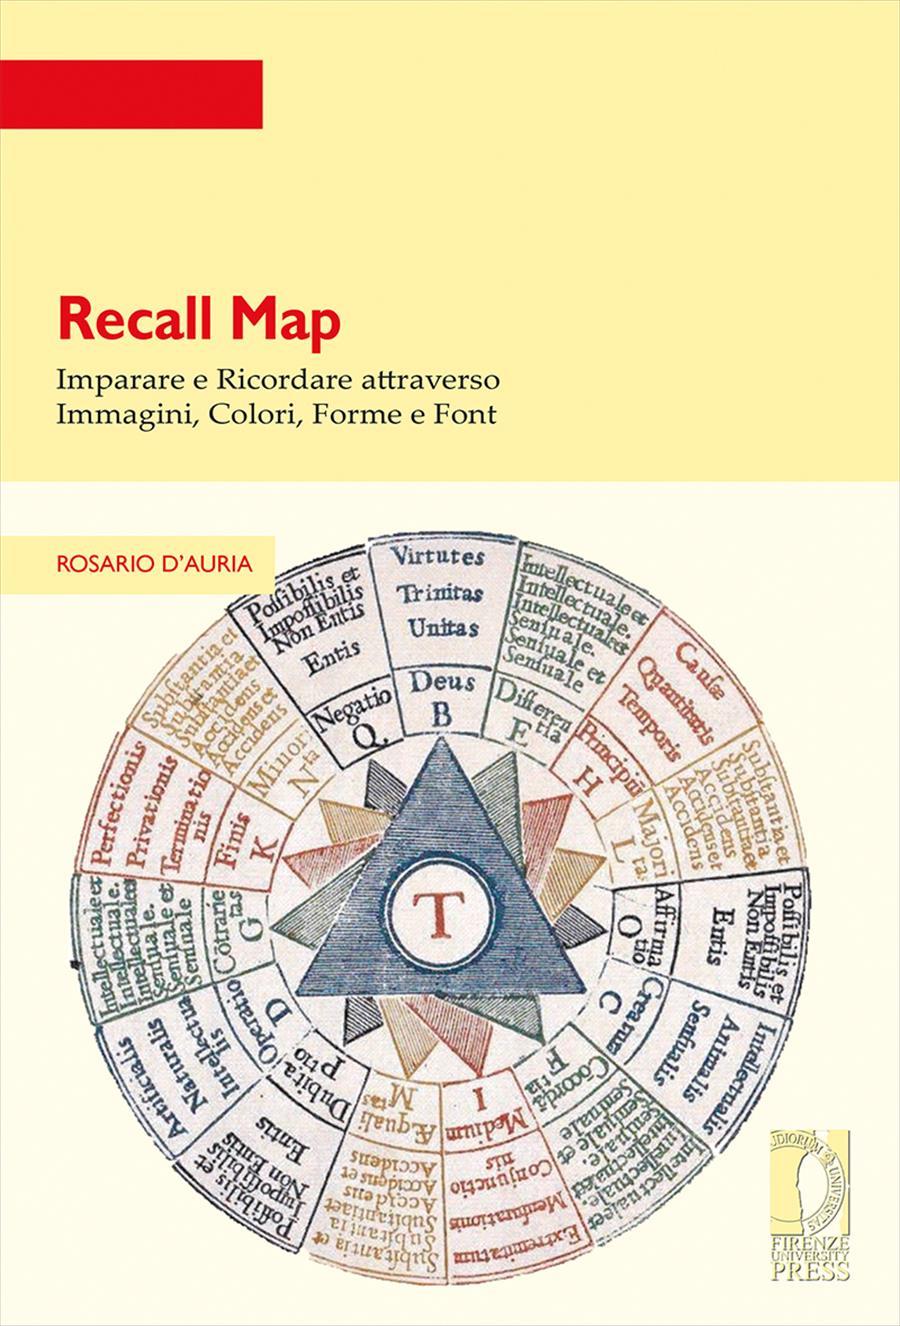 Recall Map